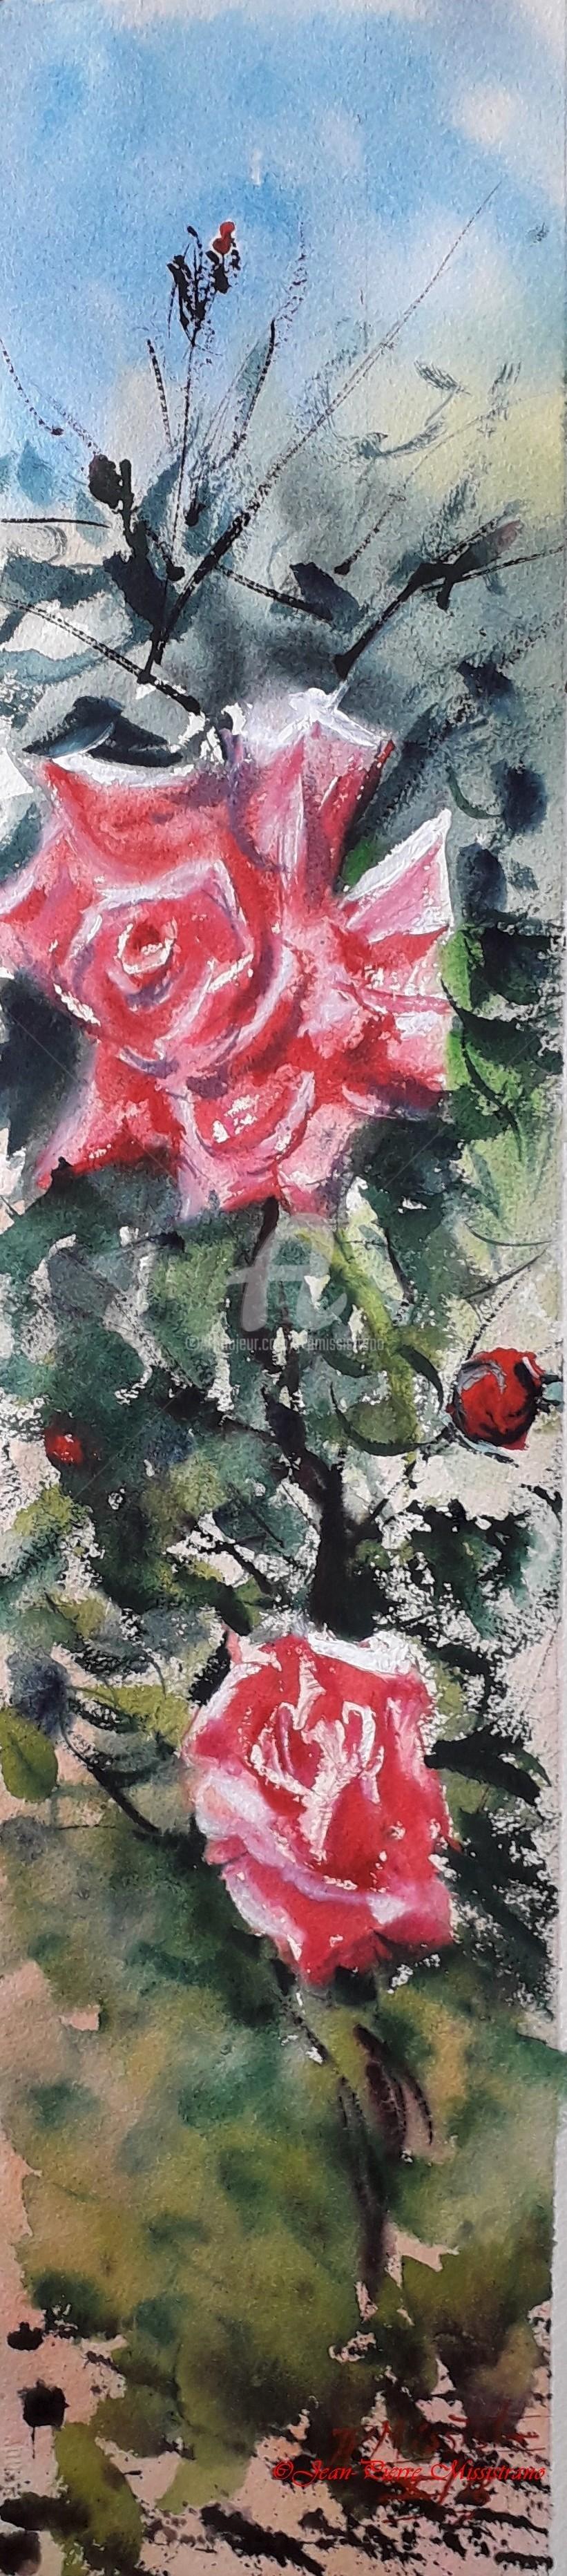 "Jean-Pierre Missistrano - ""Les Roses du Sud"""